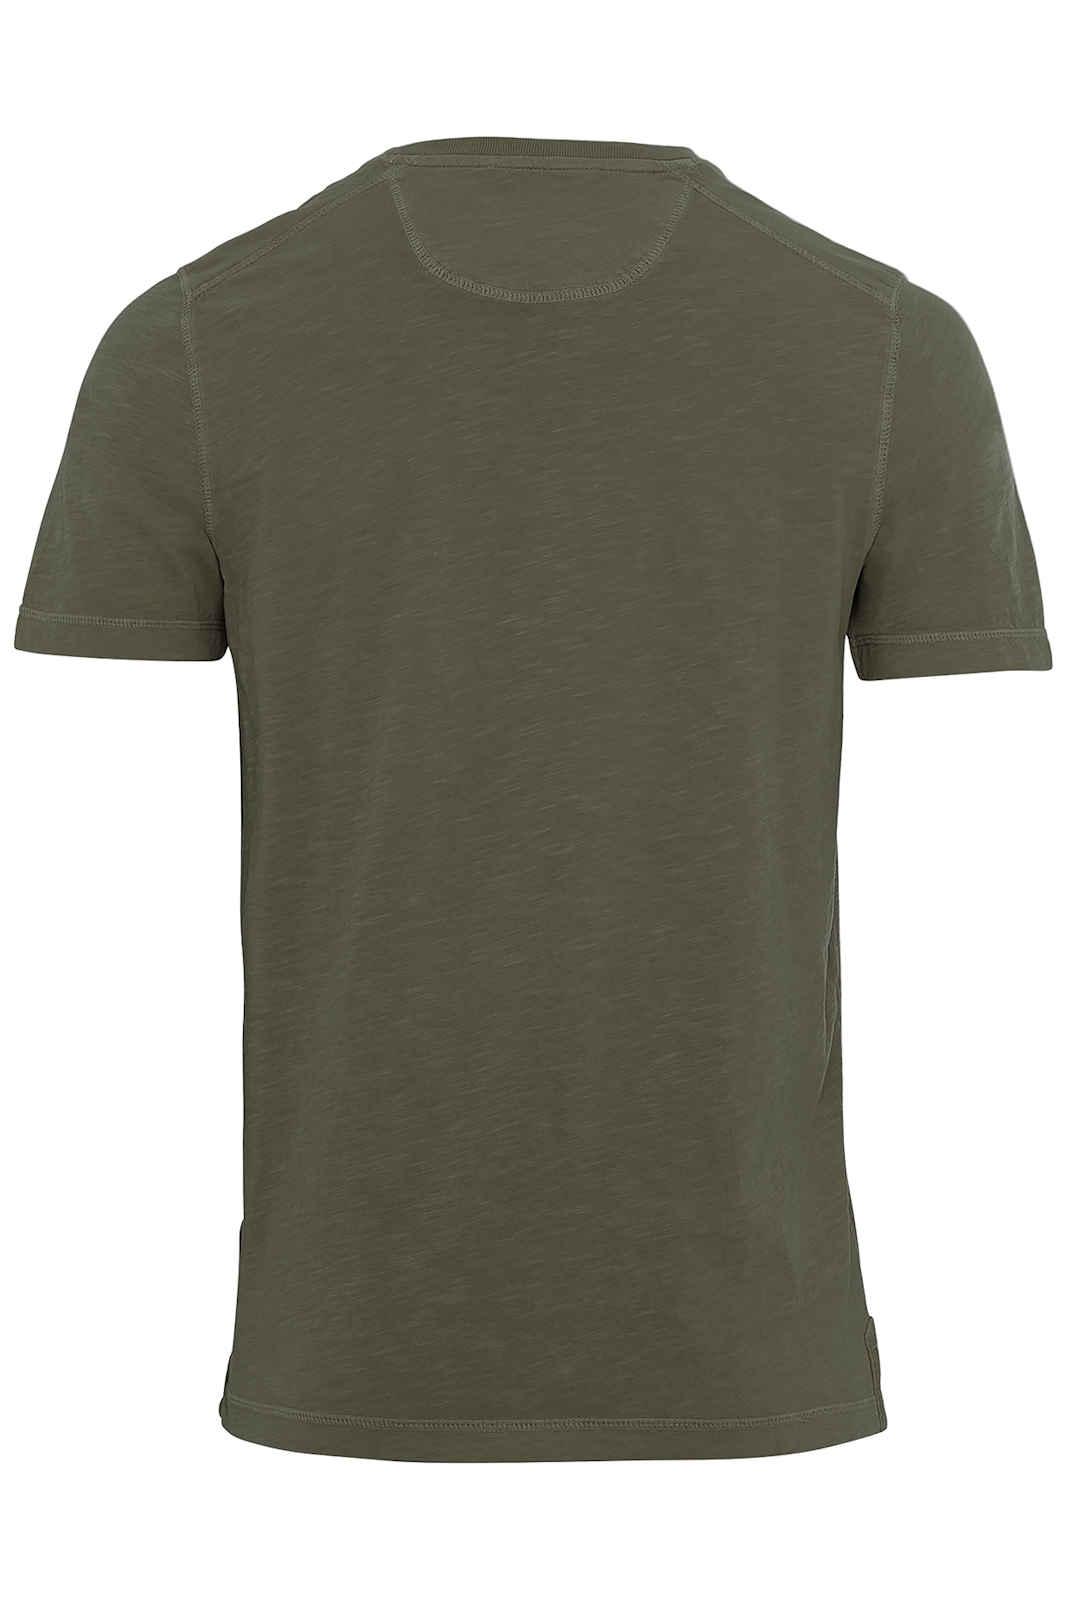 Camel Active Herren Herren T Shirt print bedruckt H-T-Shirt 1//2 Arm